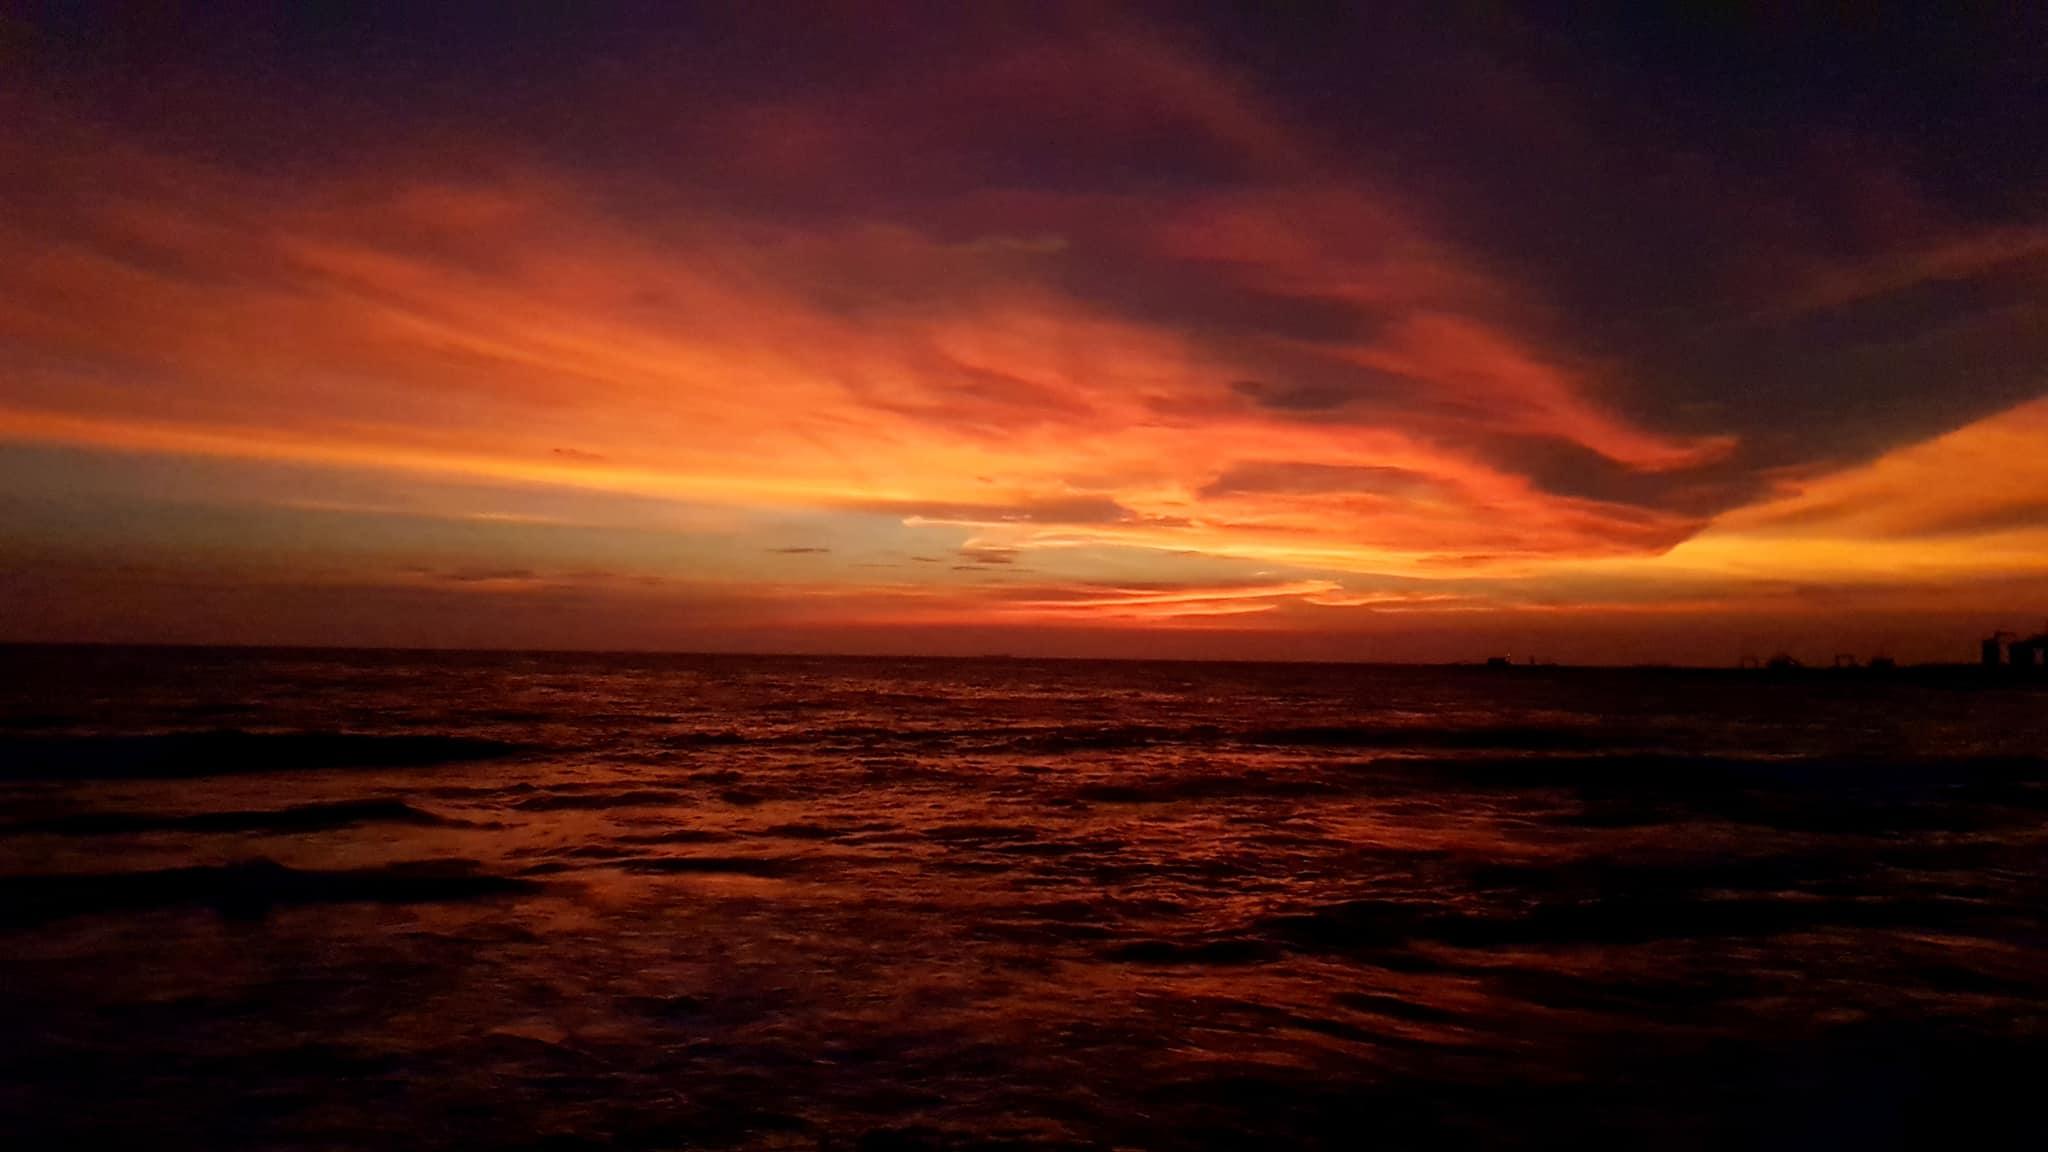 invite-to-paradise-sri-lanka-maldives-holiday-honeymoon-specialists-customer-guest-feedback-zane-lisa-butcher-colombo-galle-face-hotel-sunset-1.jpg